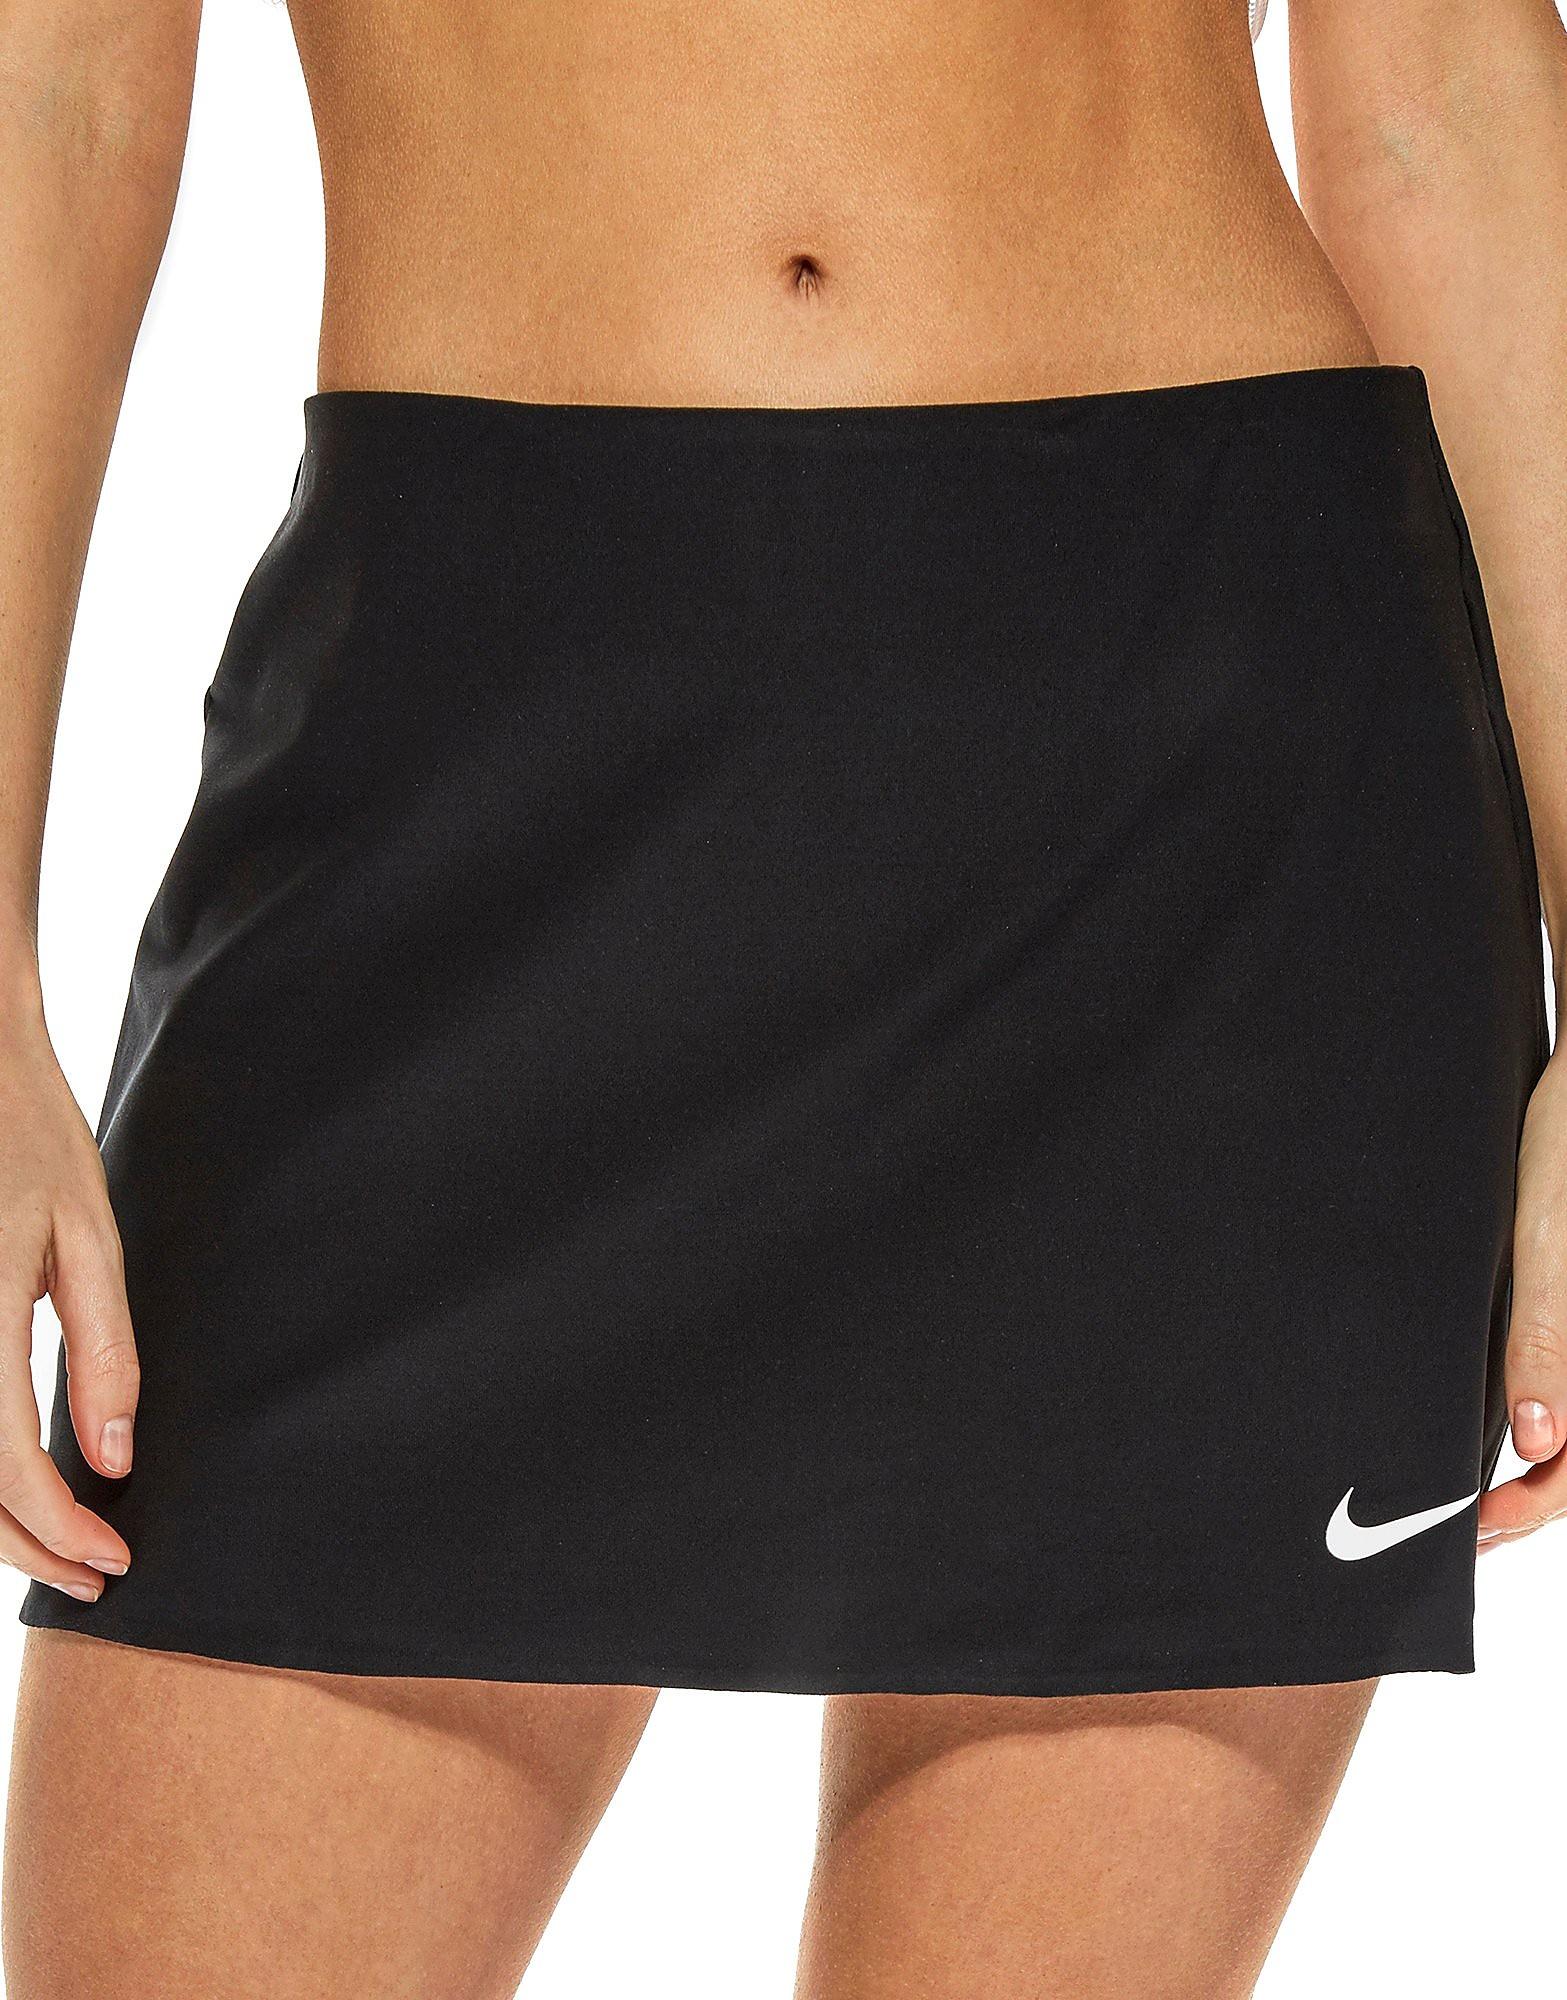 Nike Court Power Spin Women's Tennis Skirt